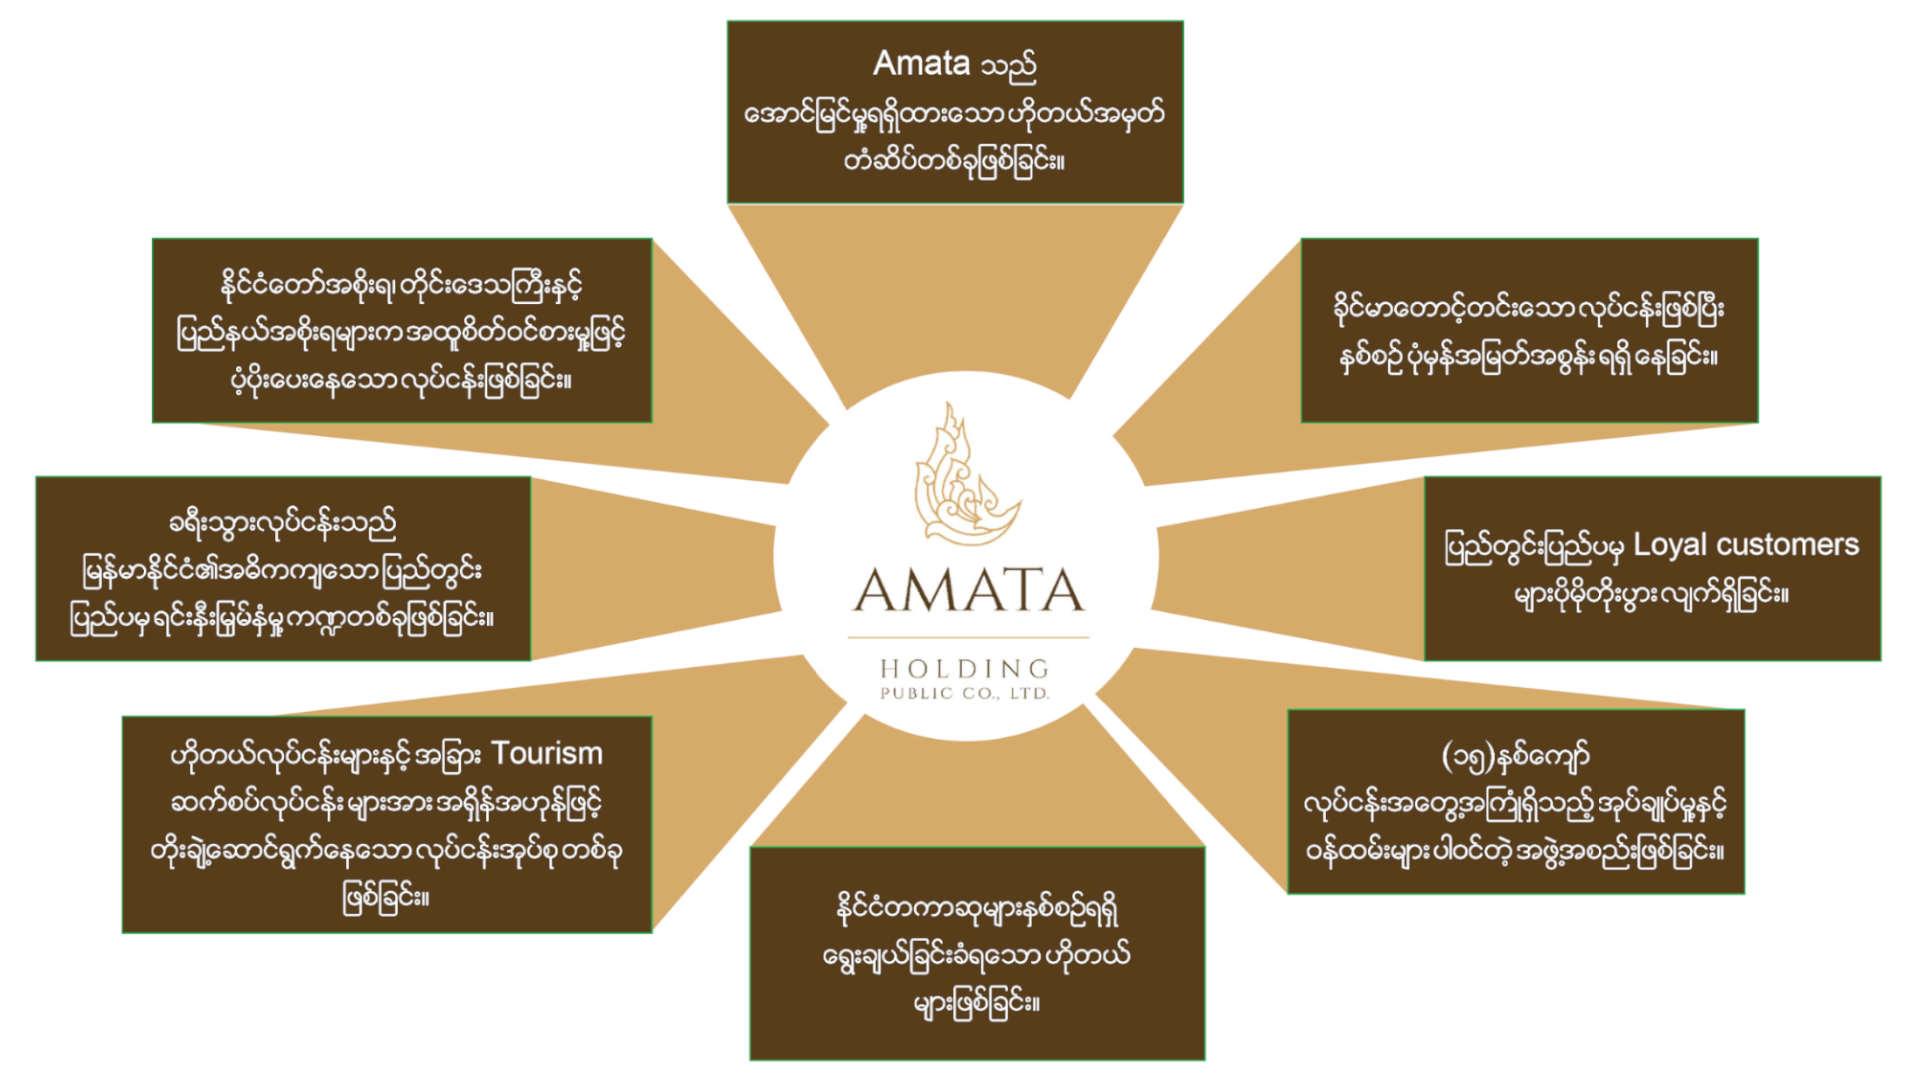 Amata Holding Public Co.,Ltd